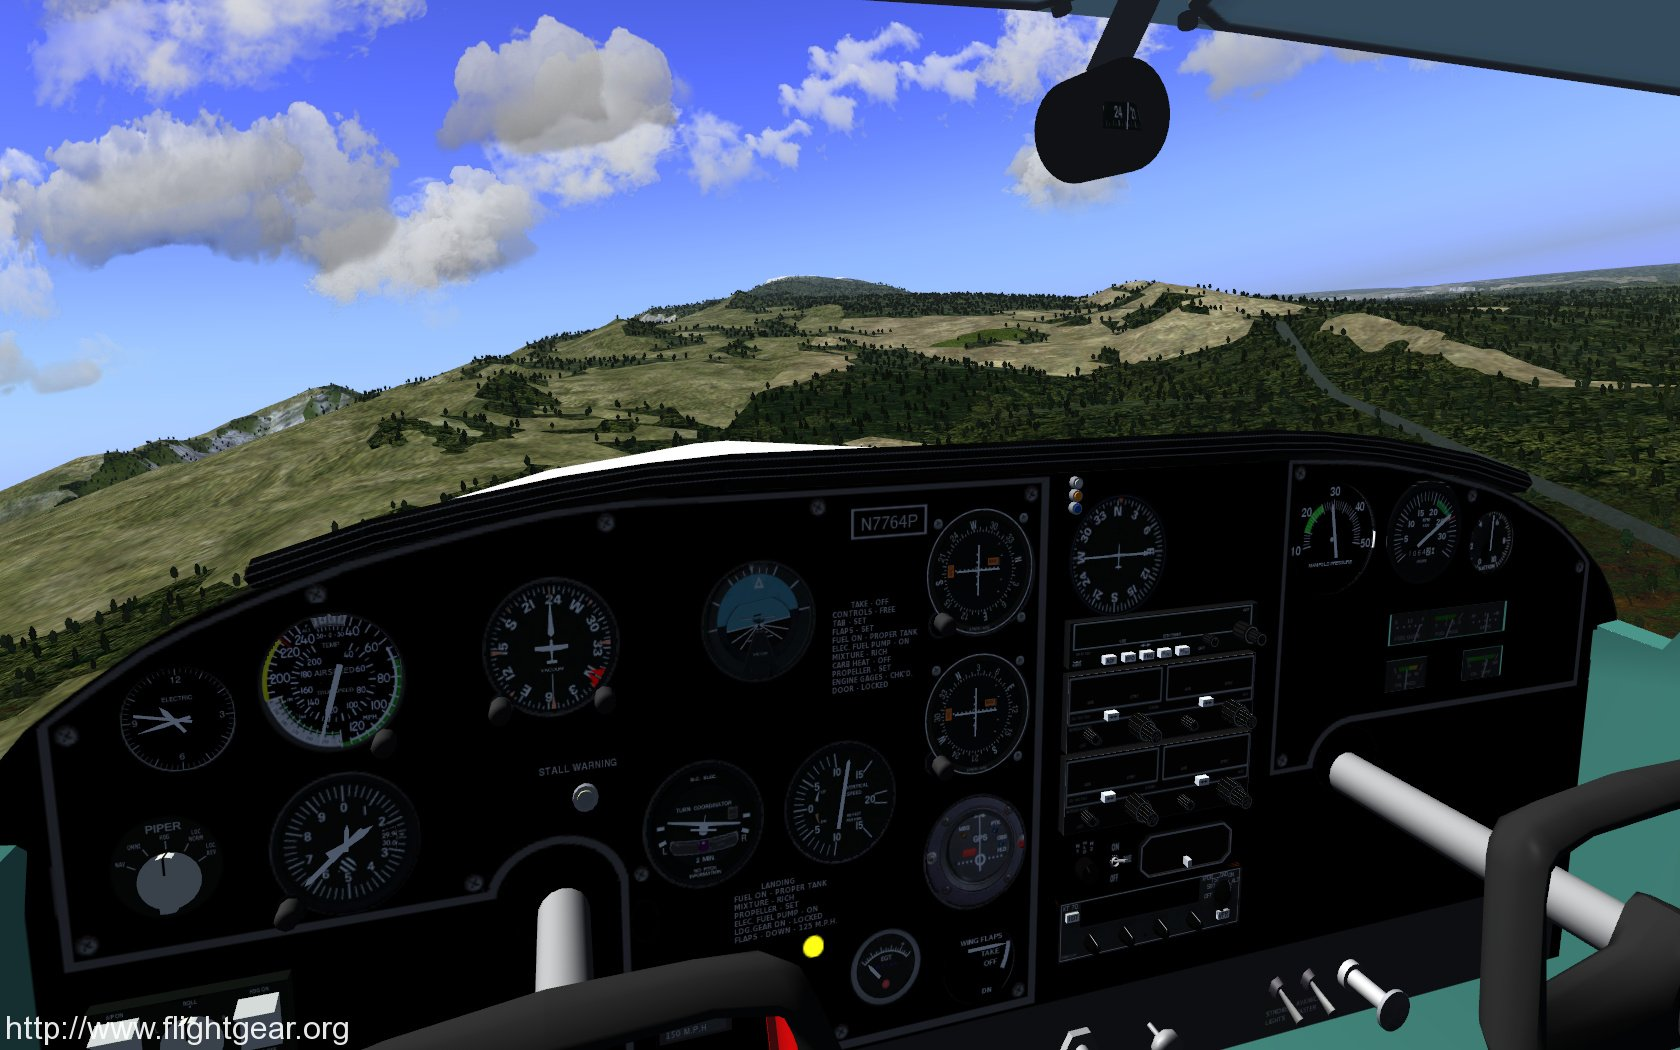 fgfs-screen-265